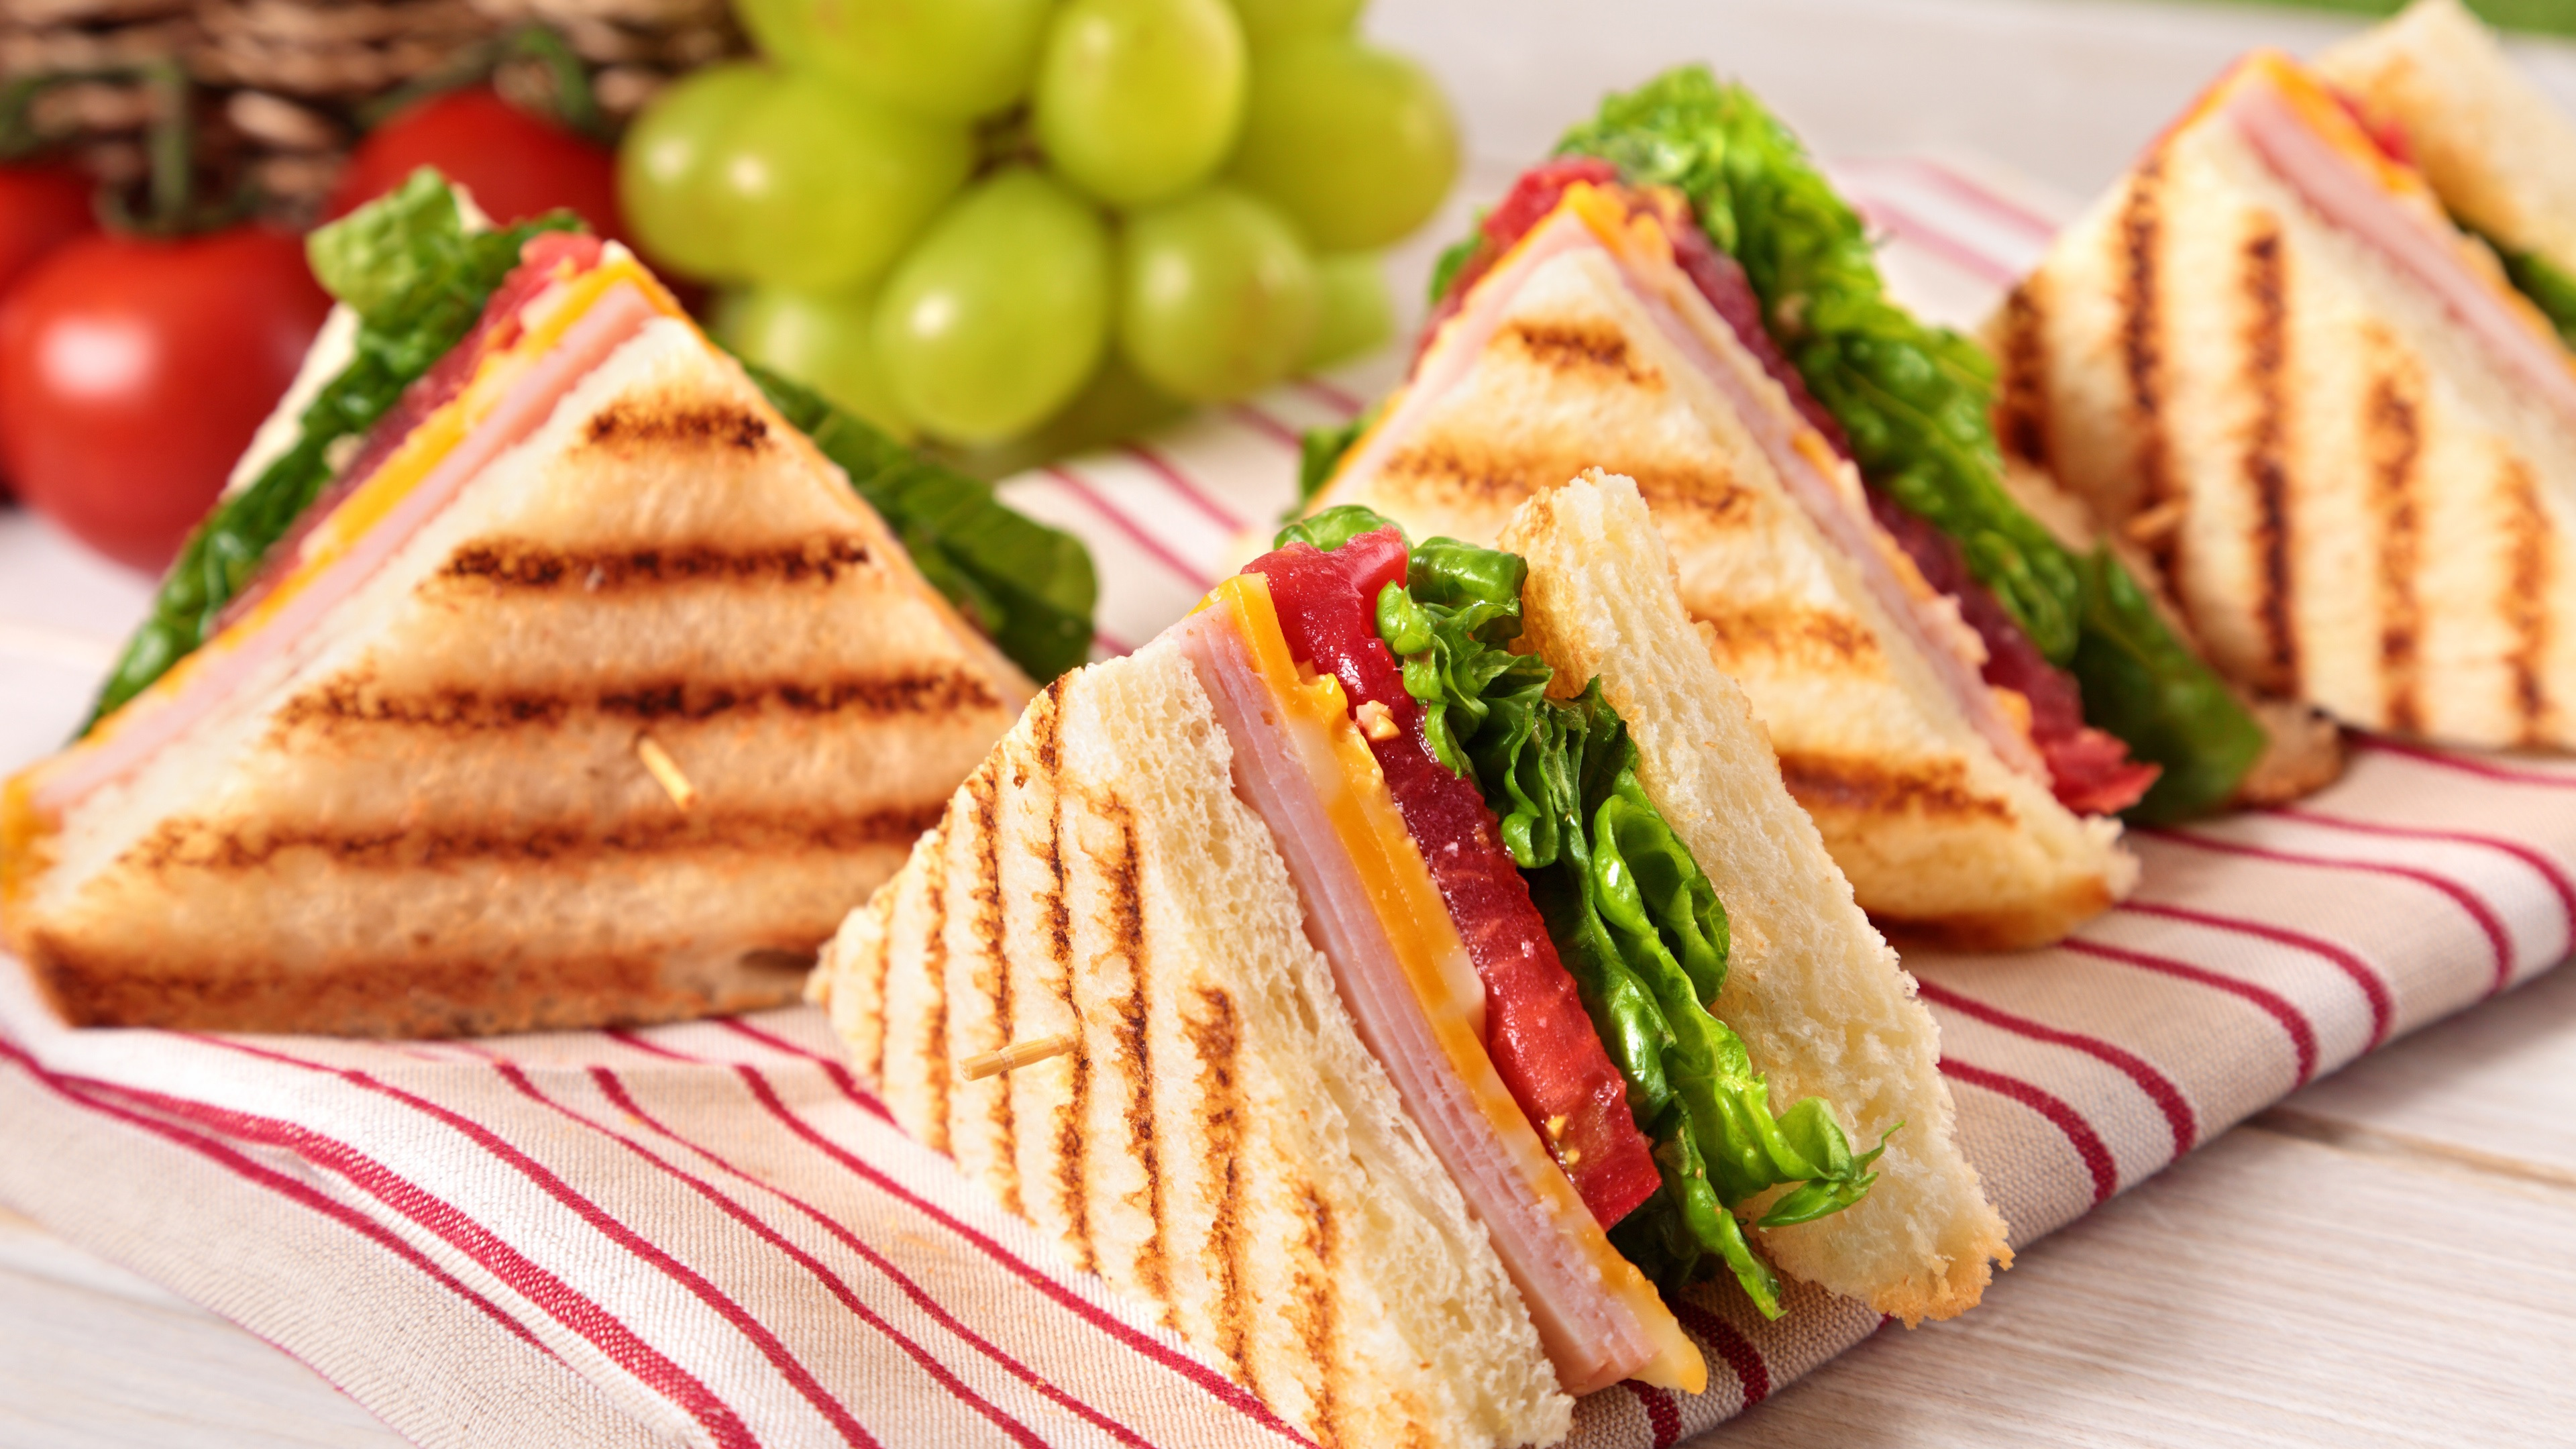 бутерброд sandwich загрузить